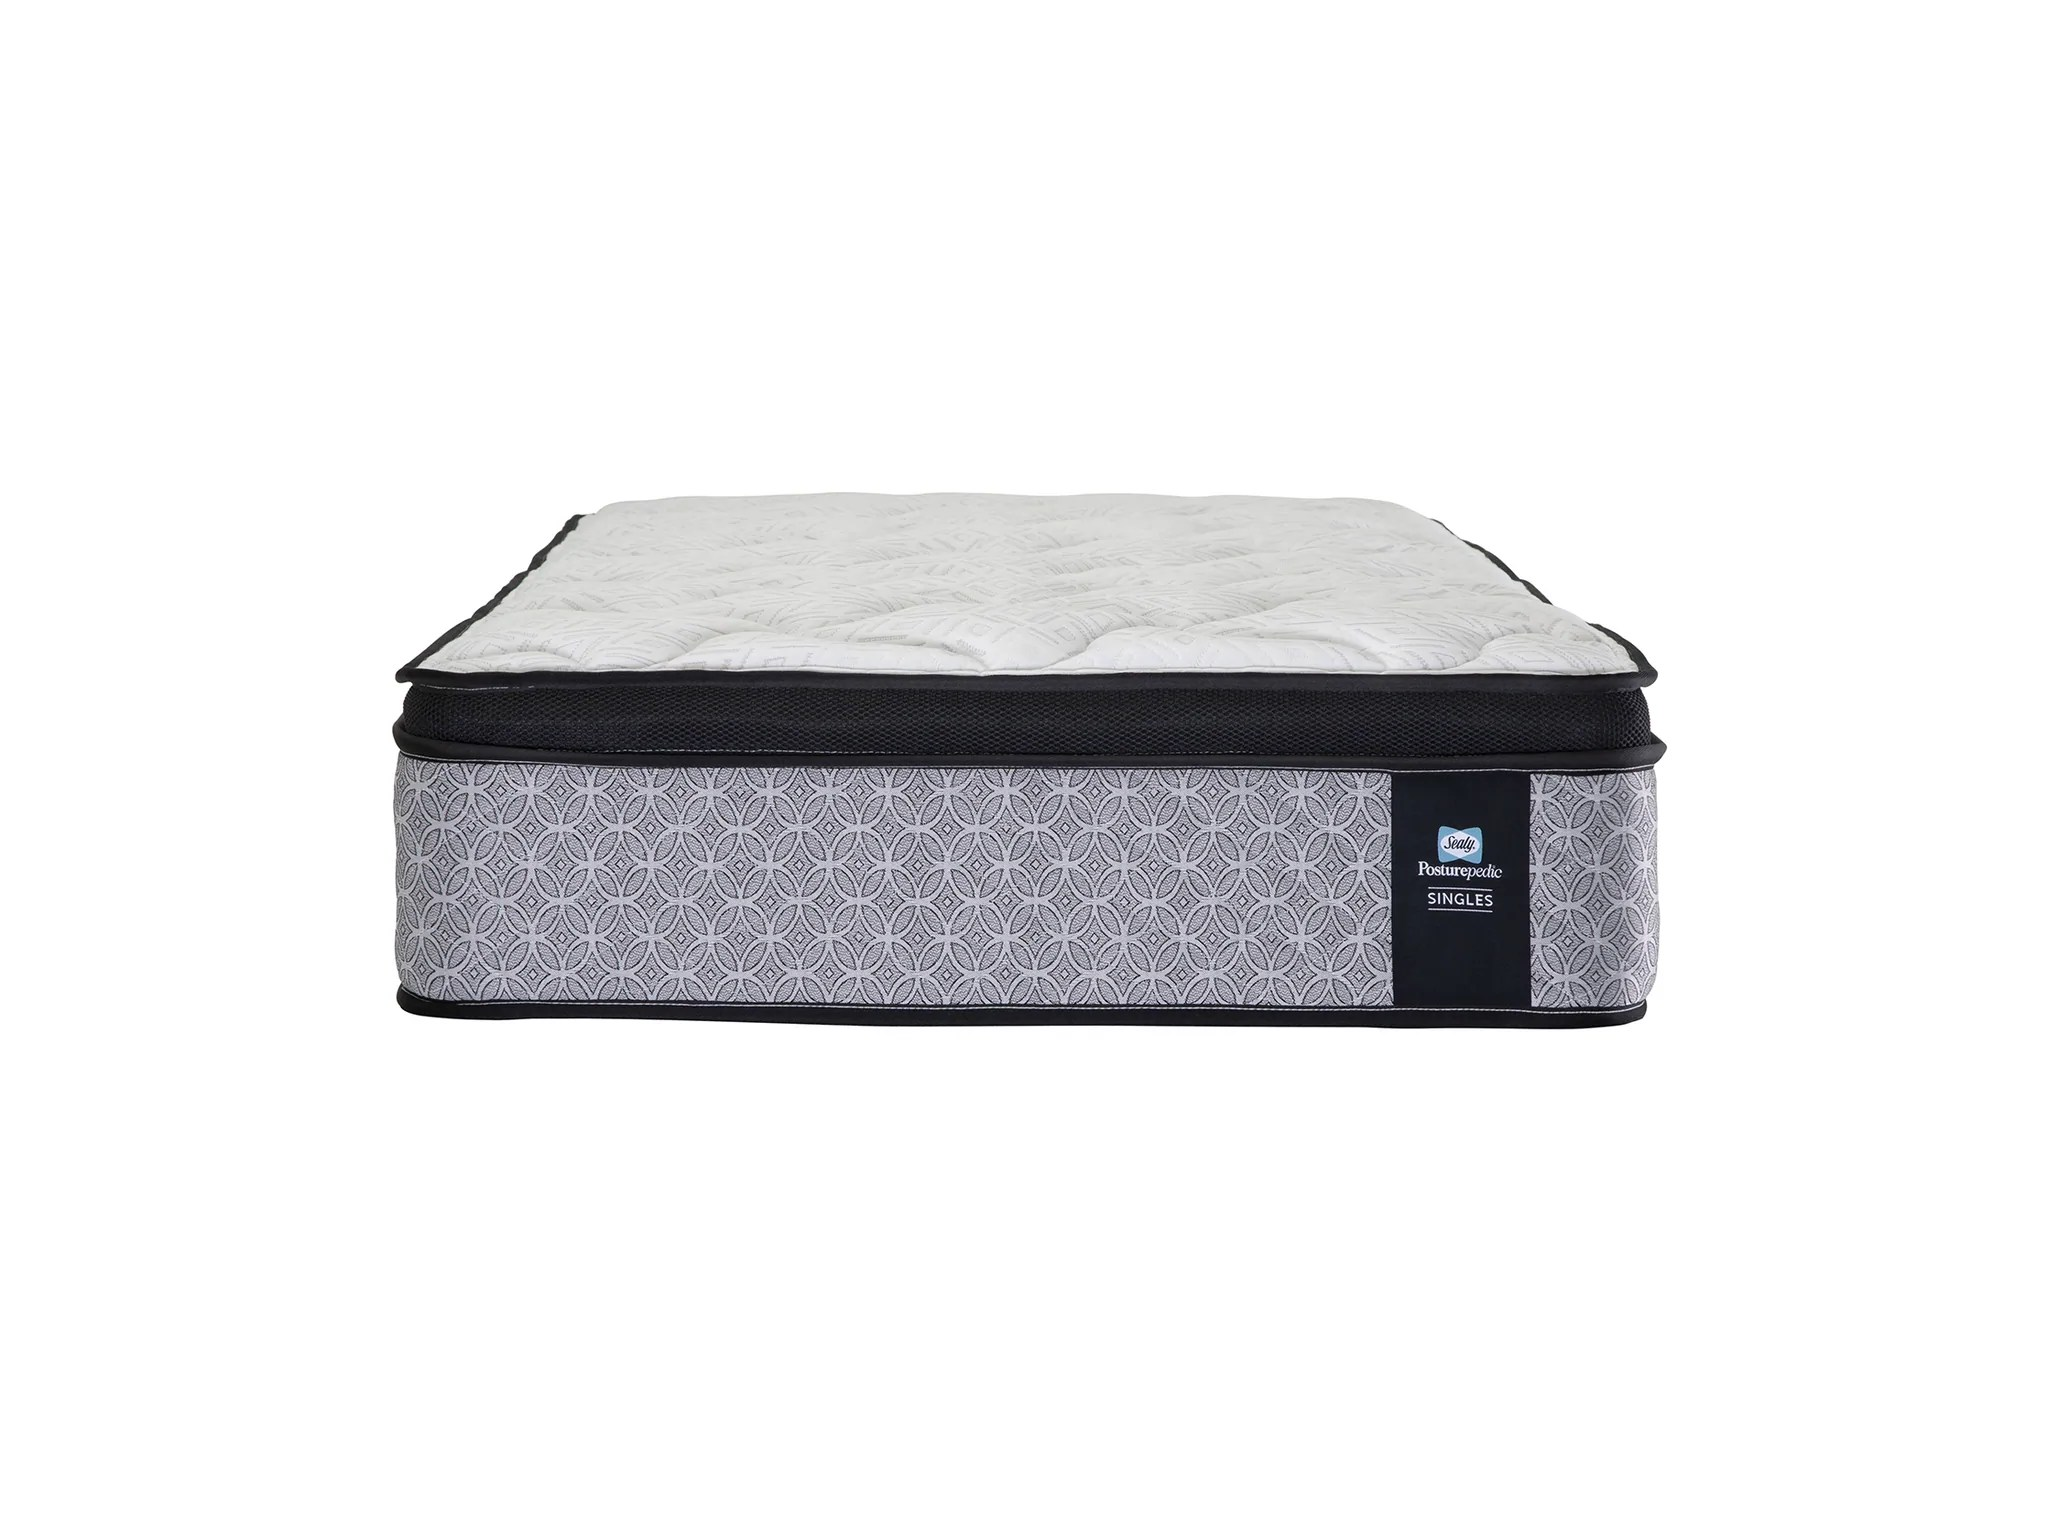 sealy posturepedic elite pillowtop mattress